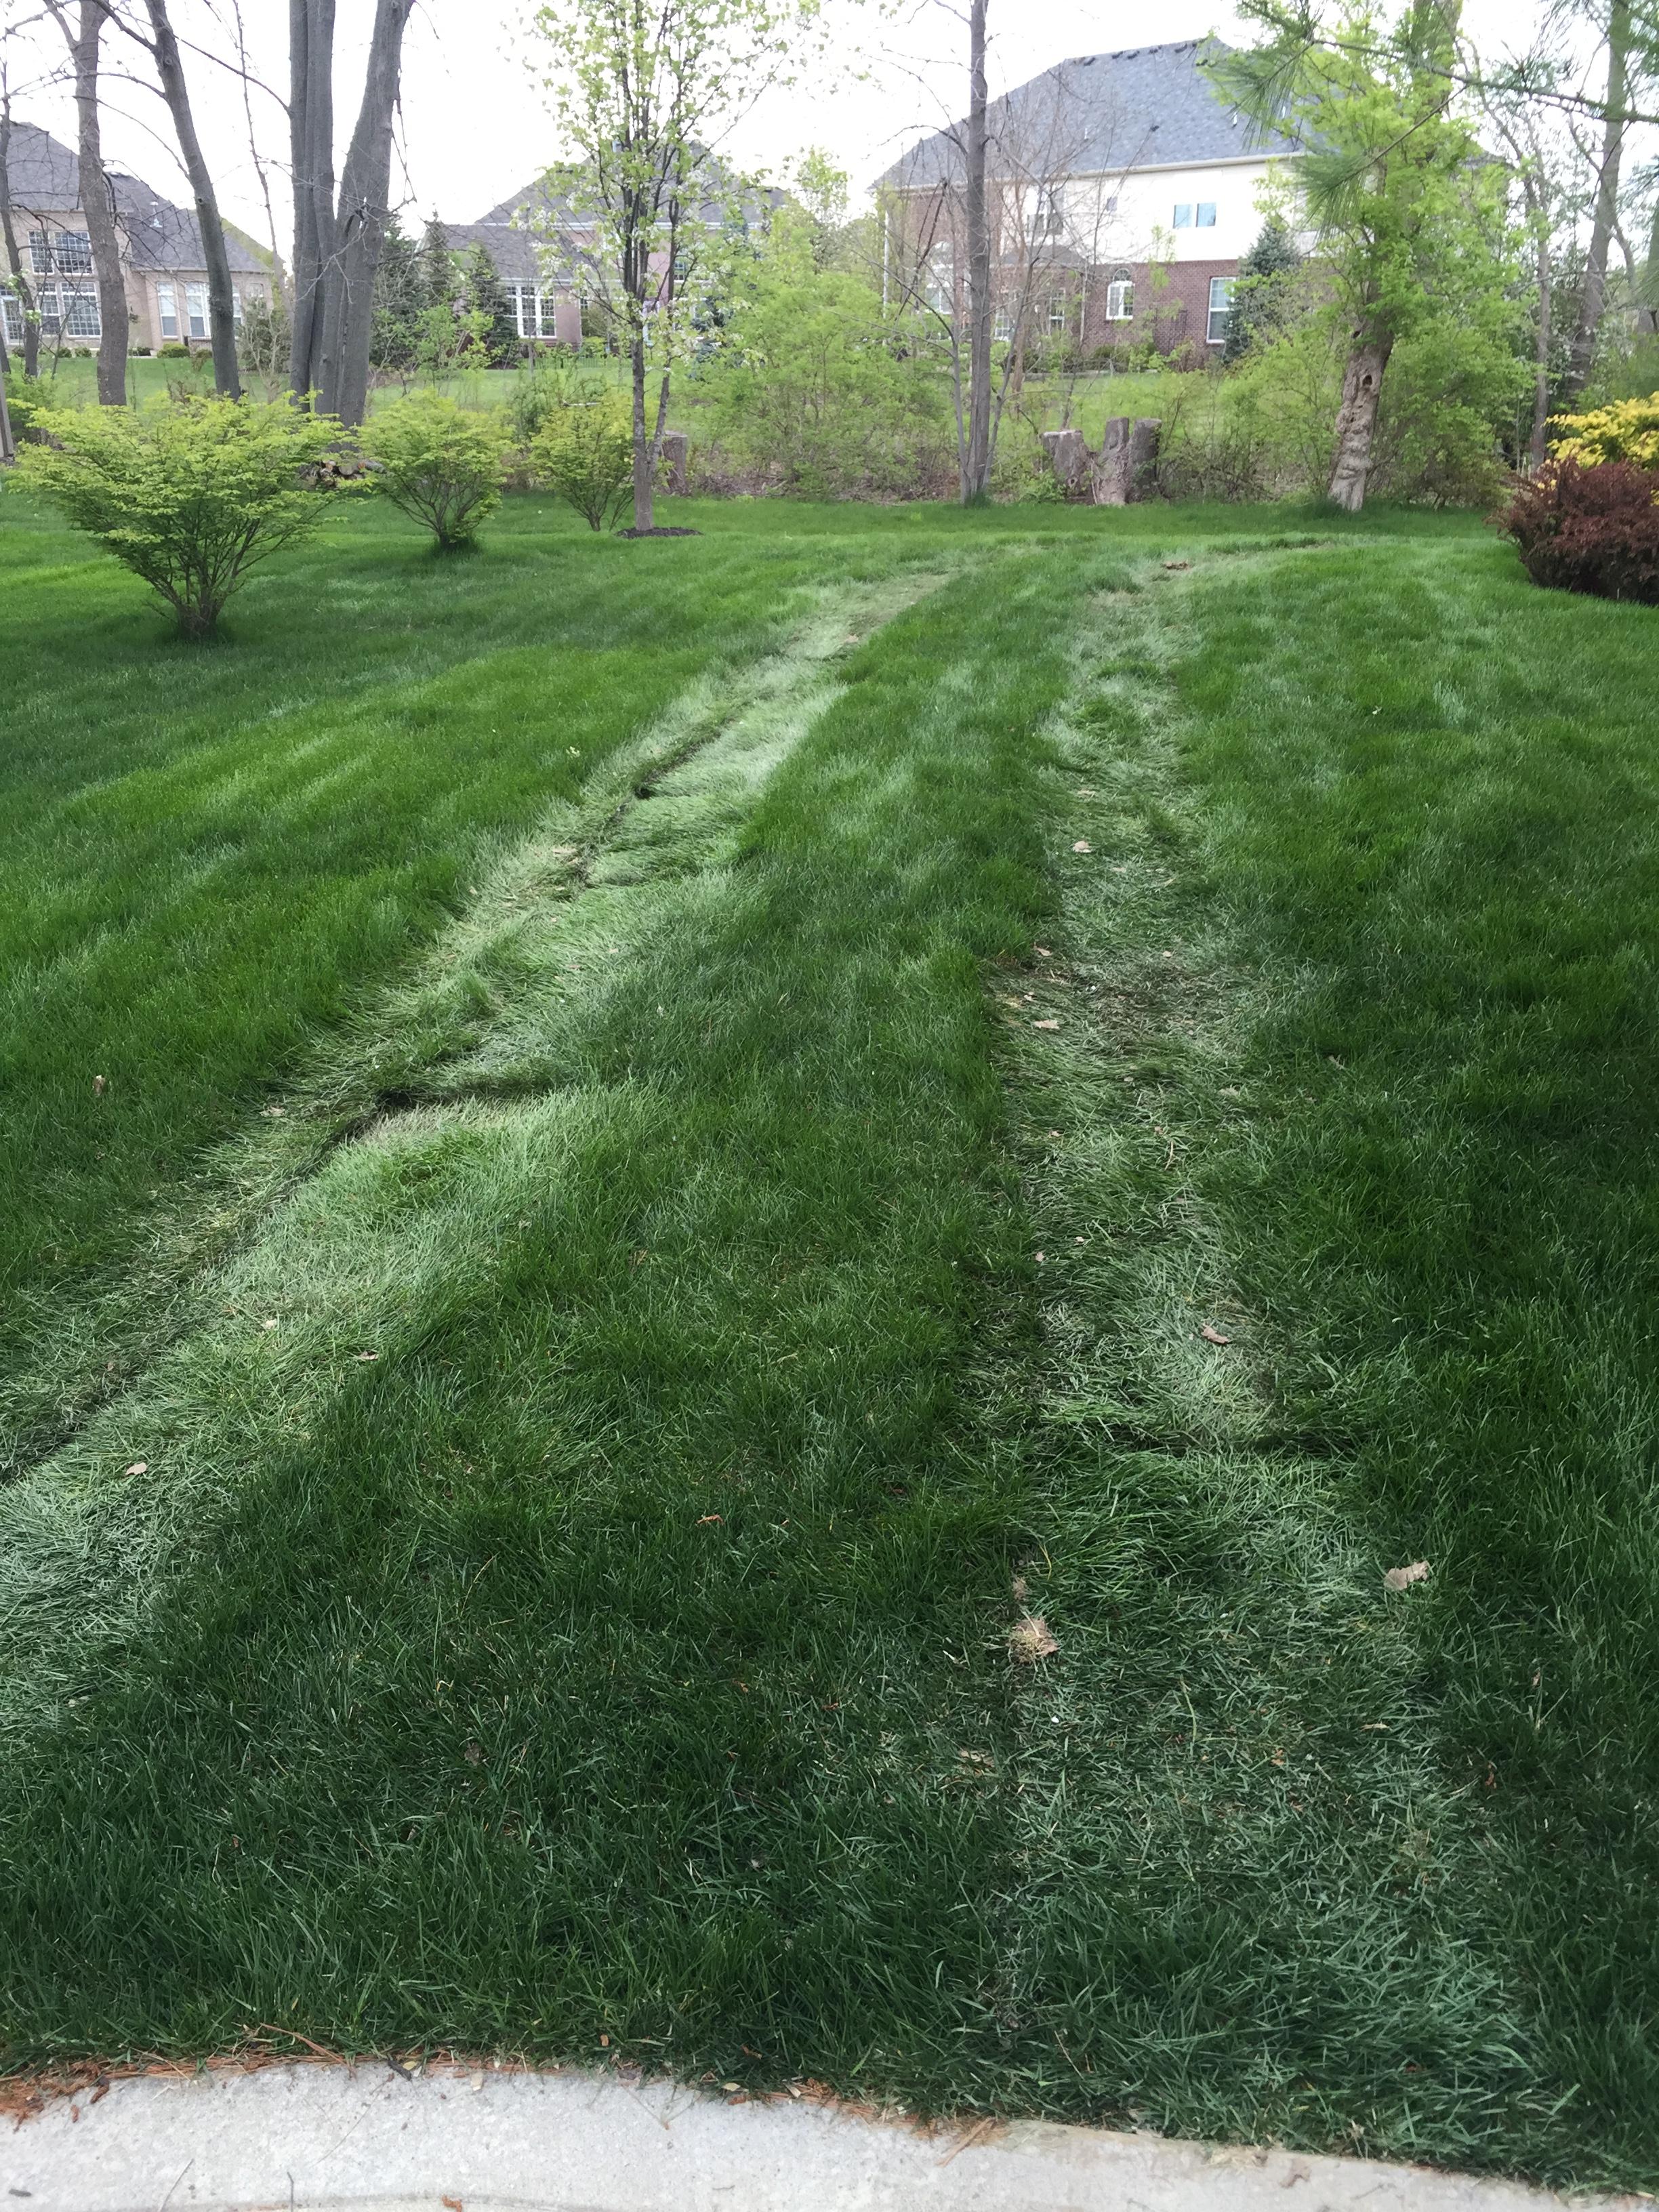 Tracks in yard.